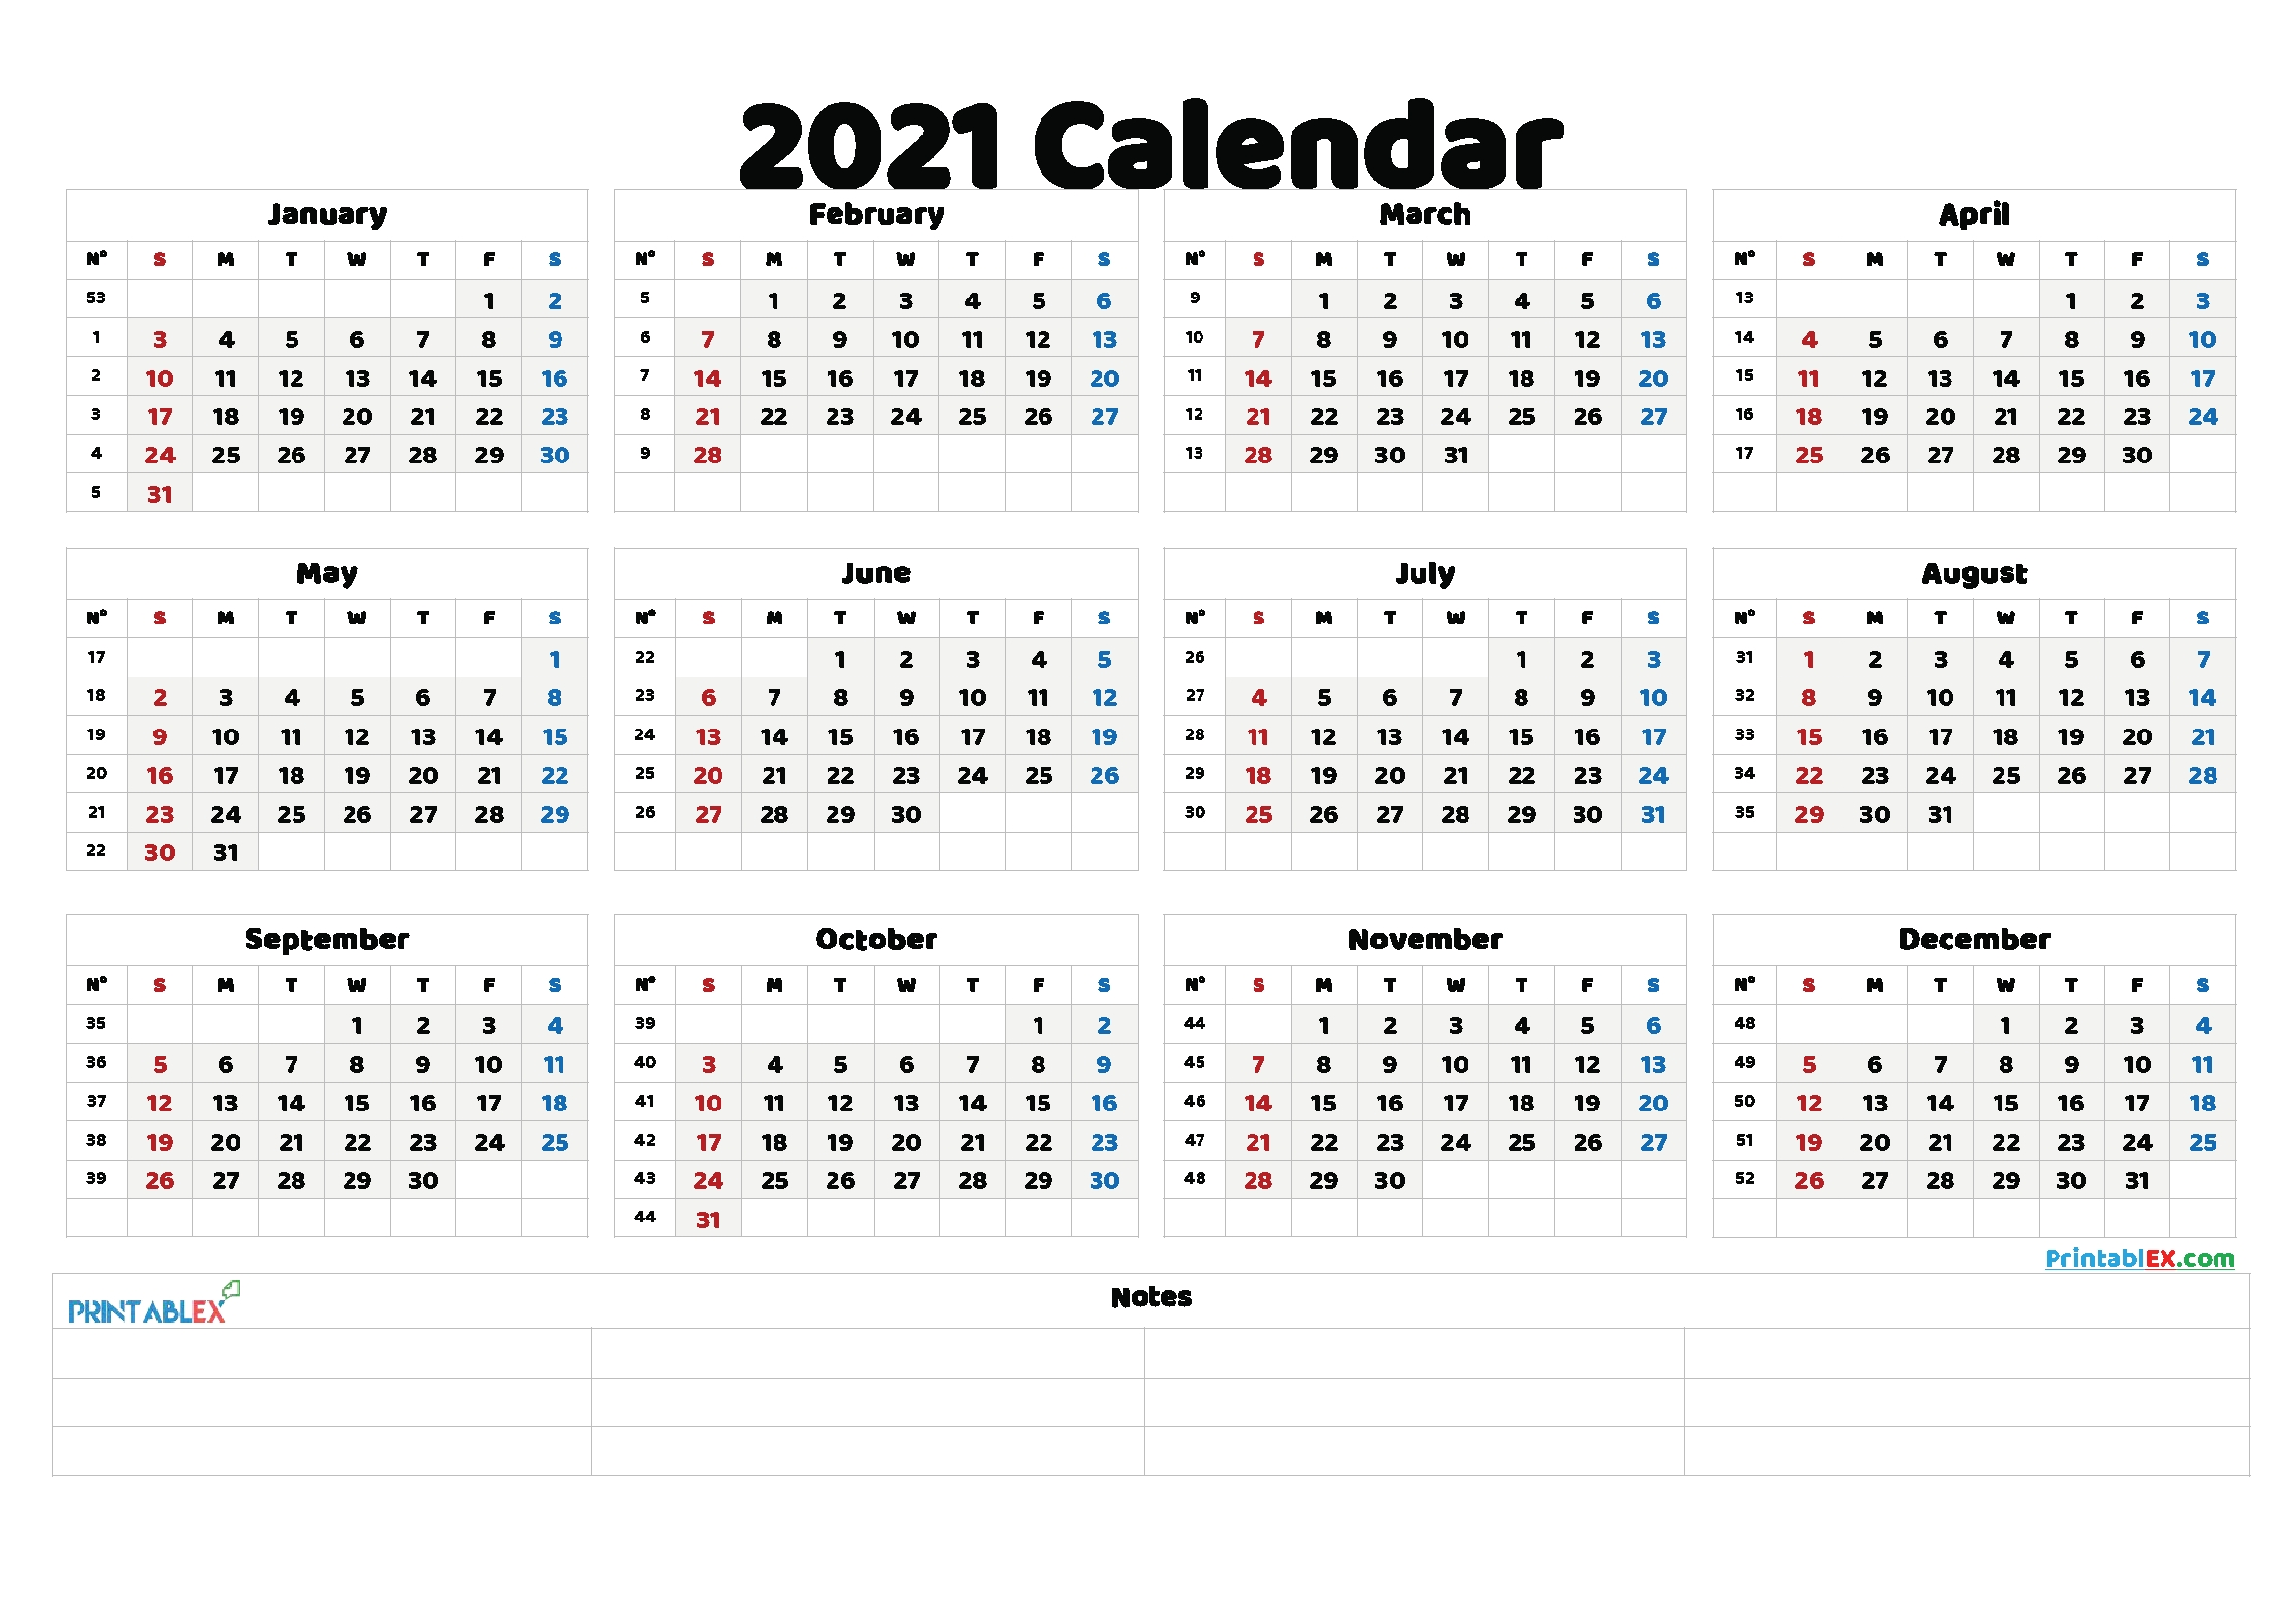 Take 2021 Caledar Year Week And Dates Excel